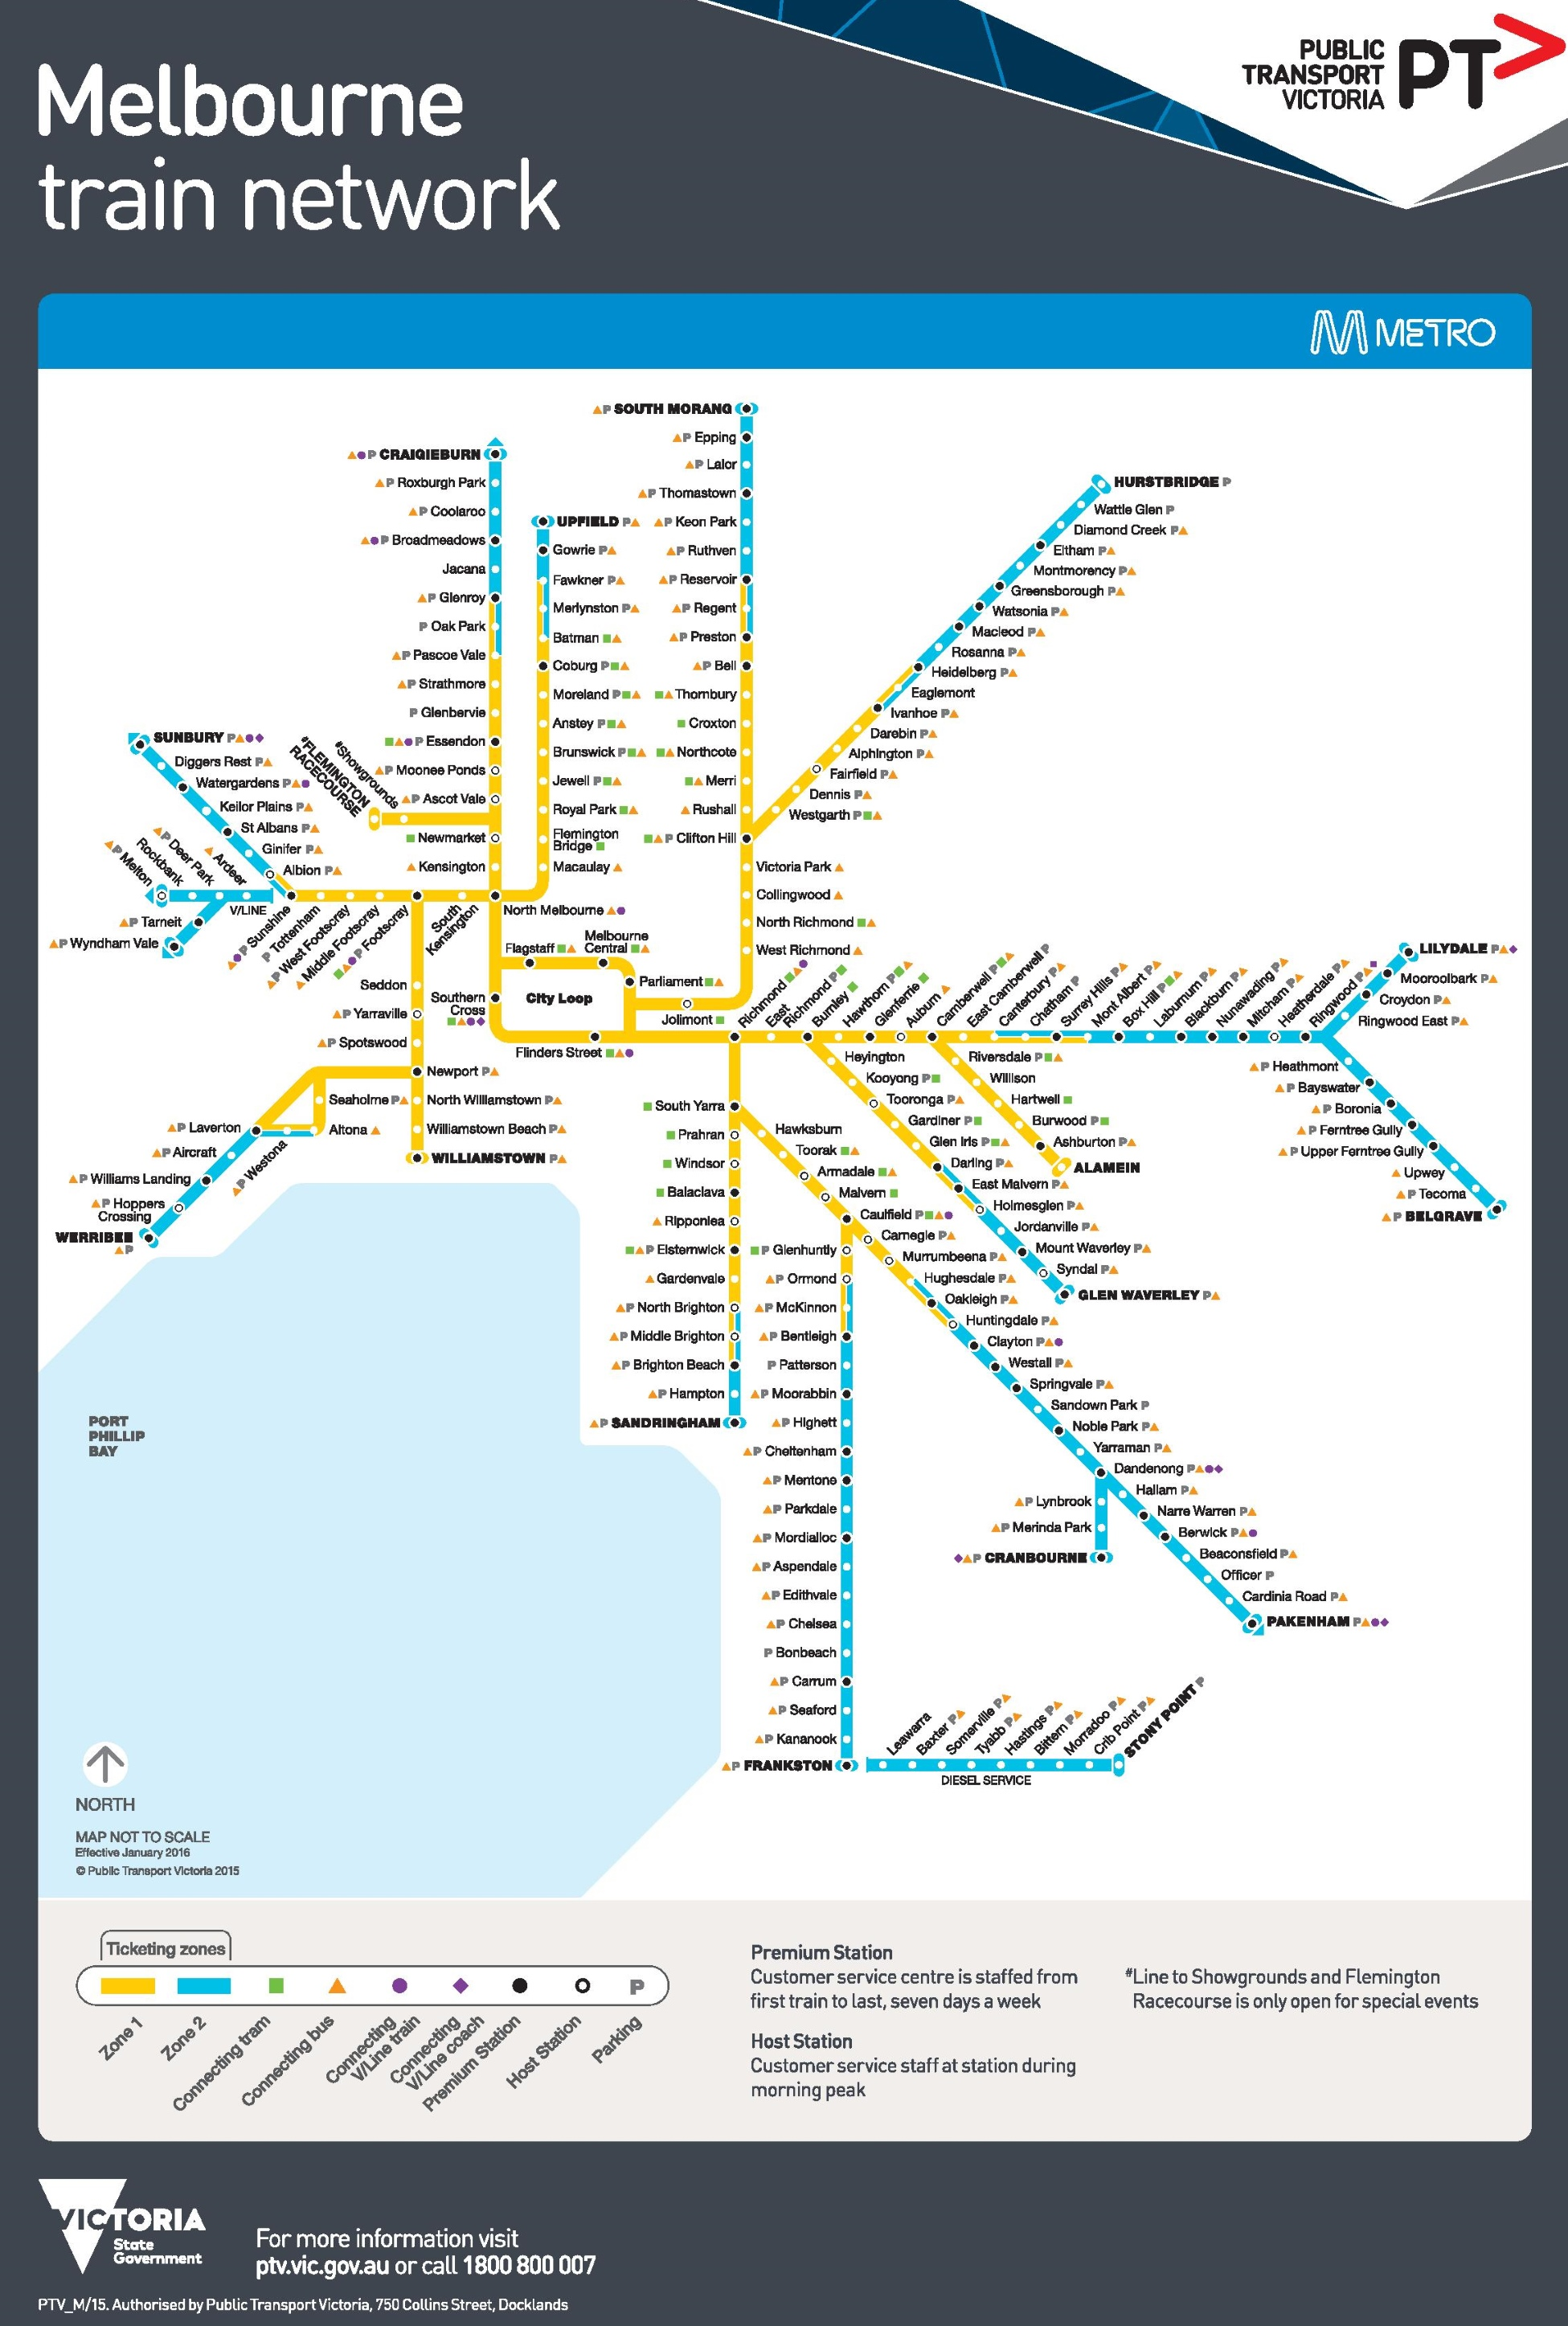 Melbourne metro train map